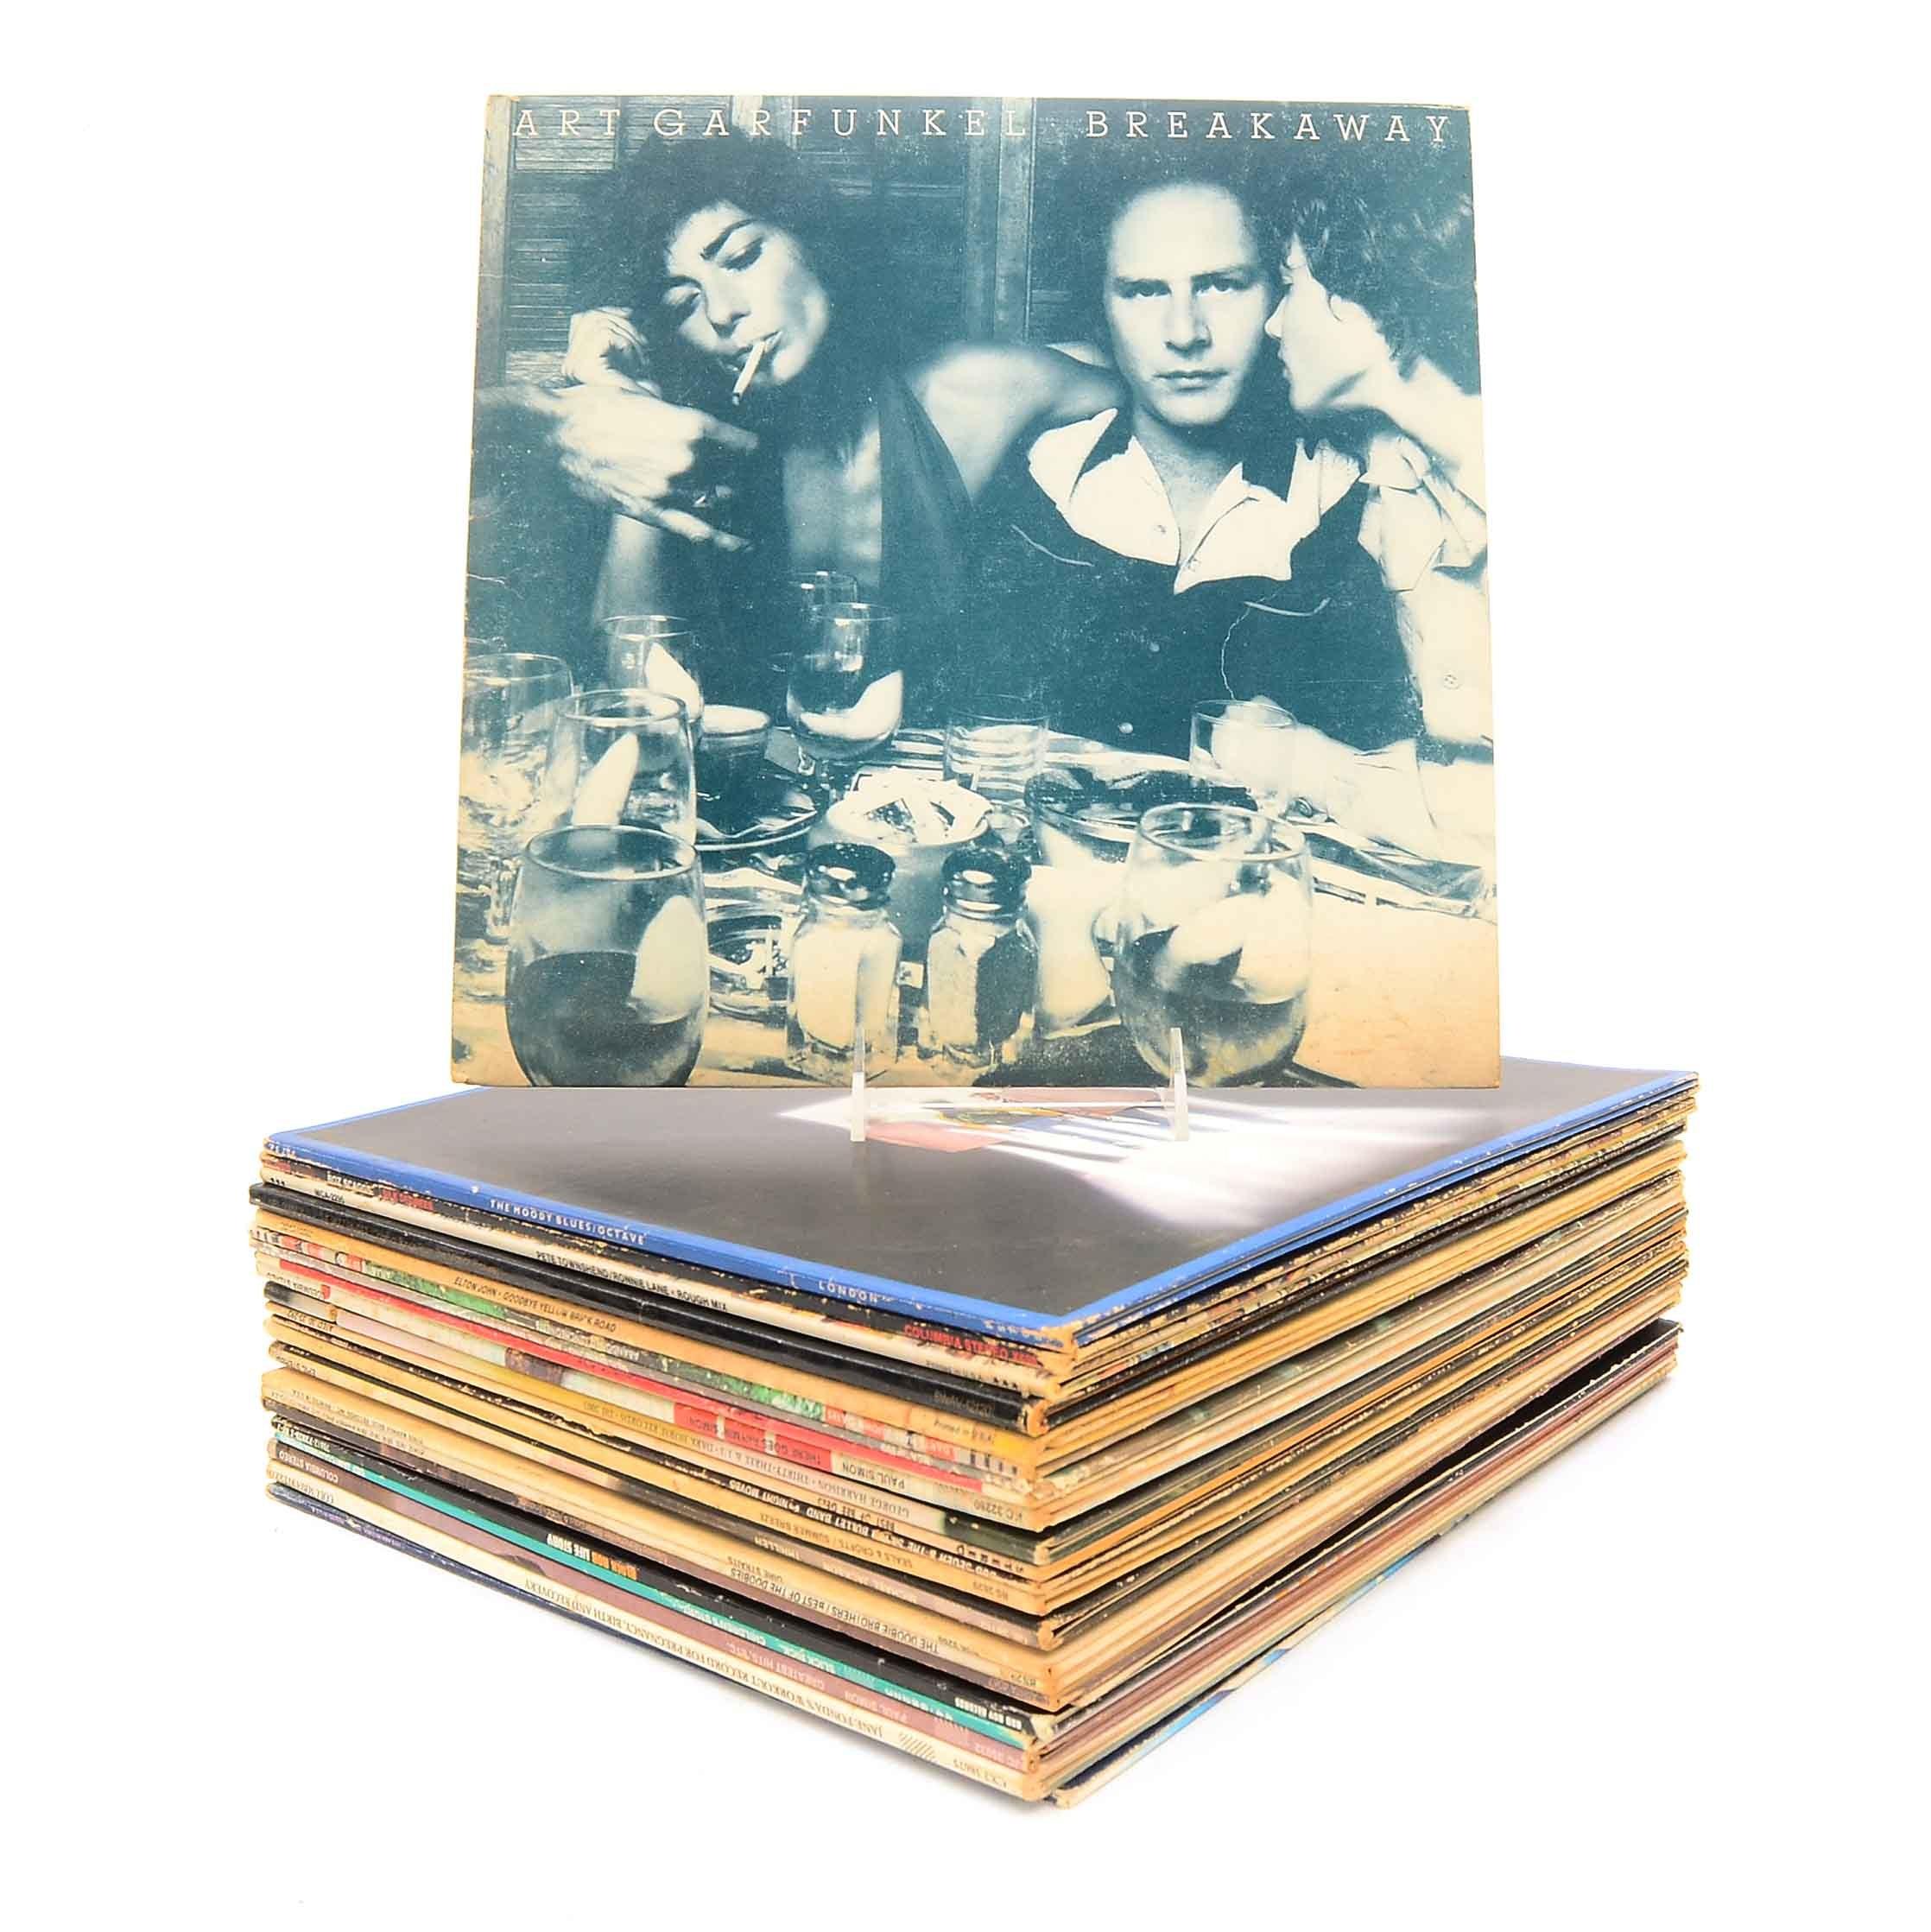 Collection of Twenty-Five LP Records